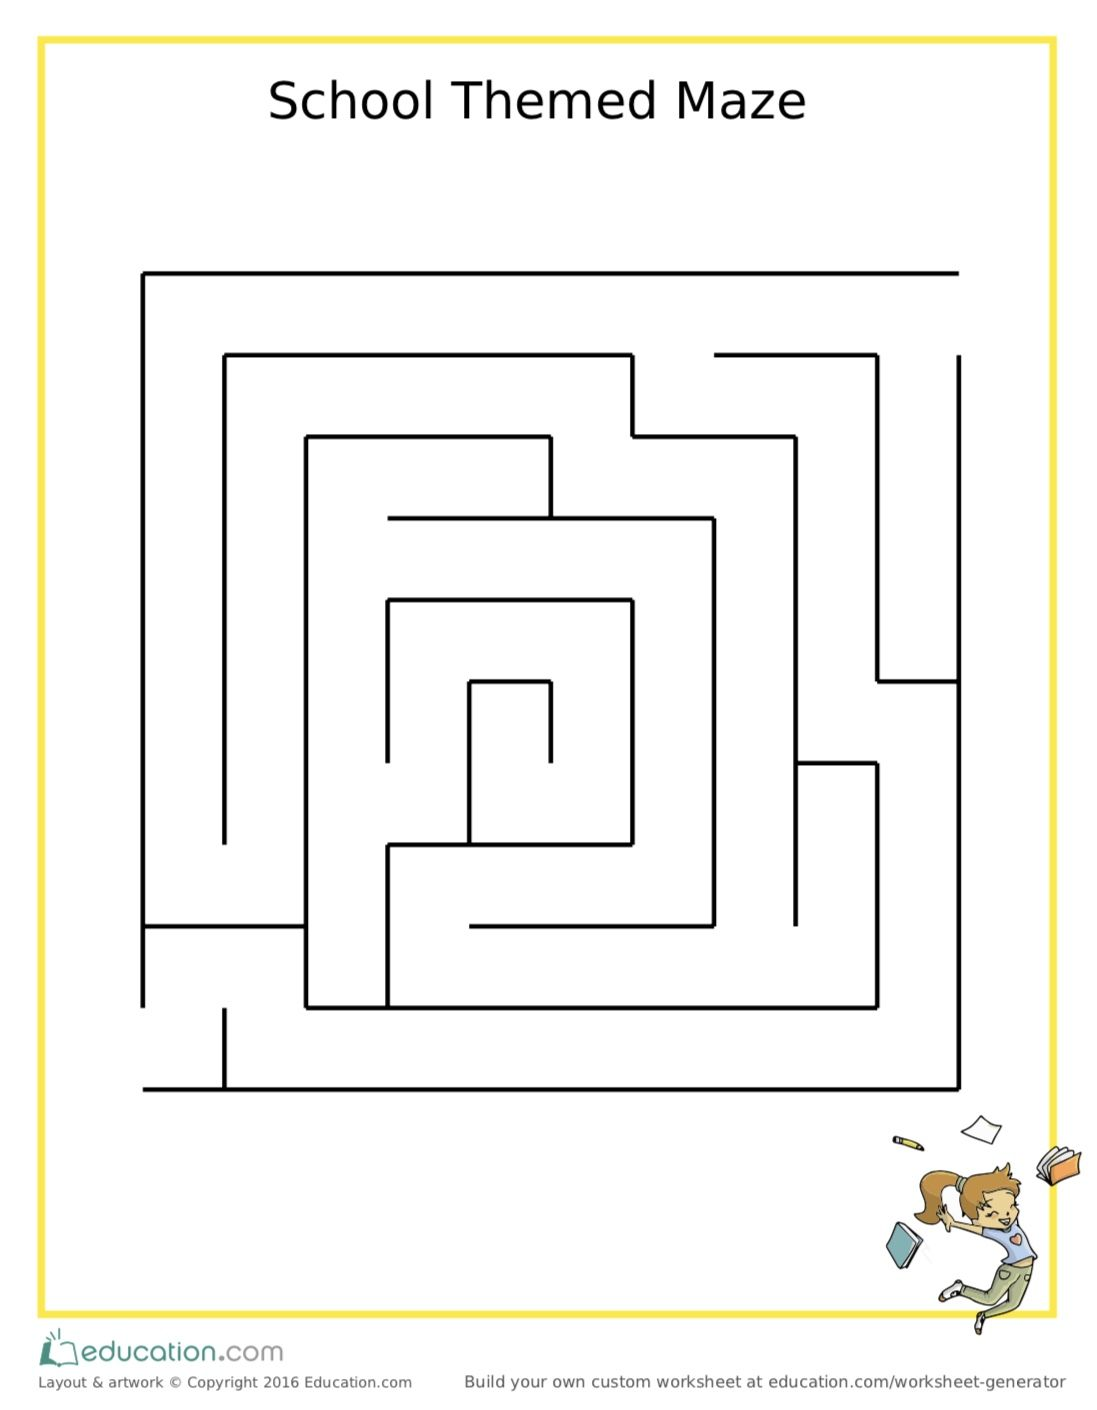 School Themed Maze Printable